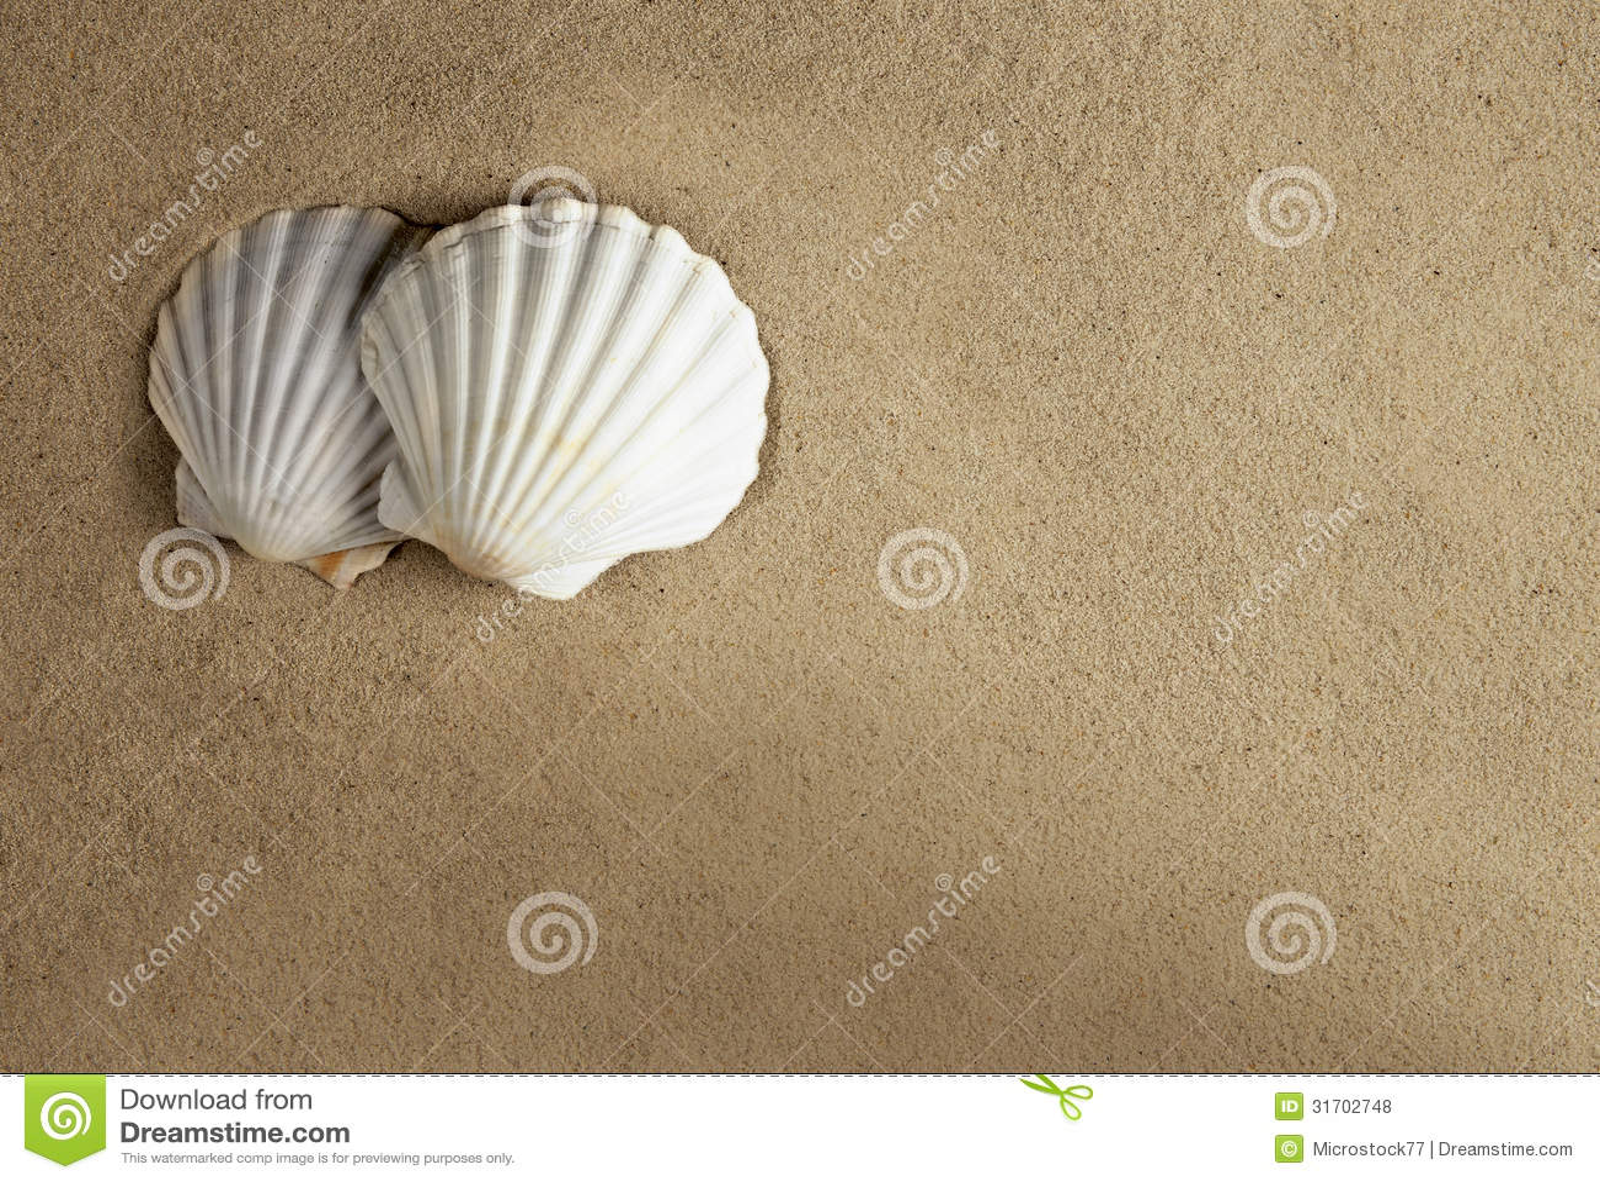 Shell sand romantic